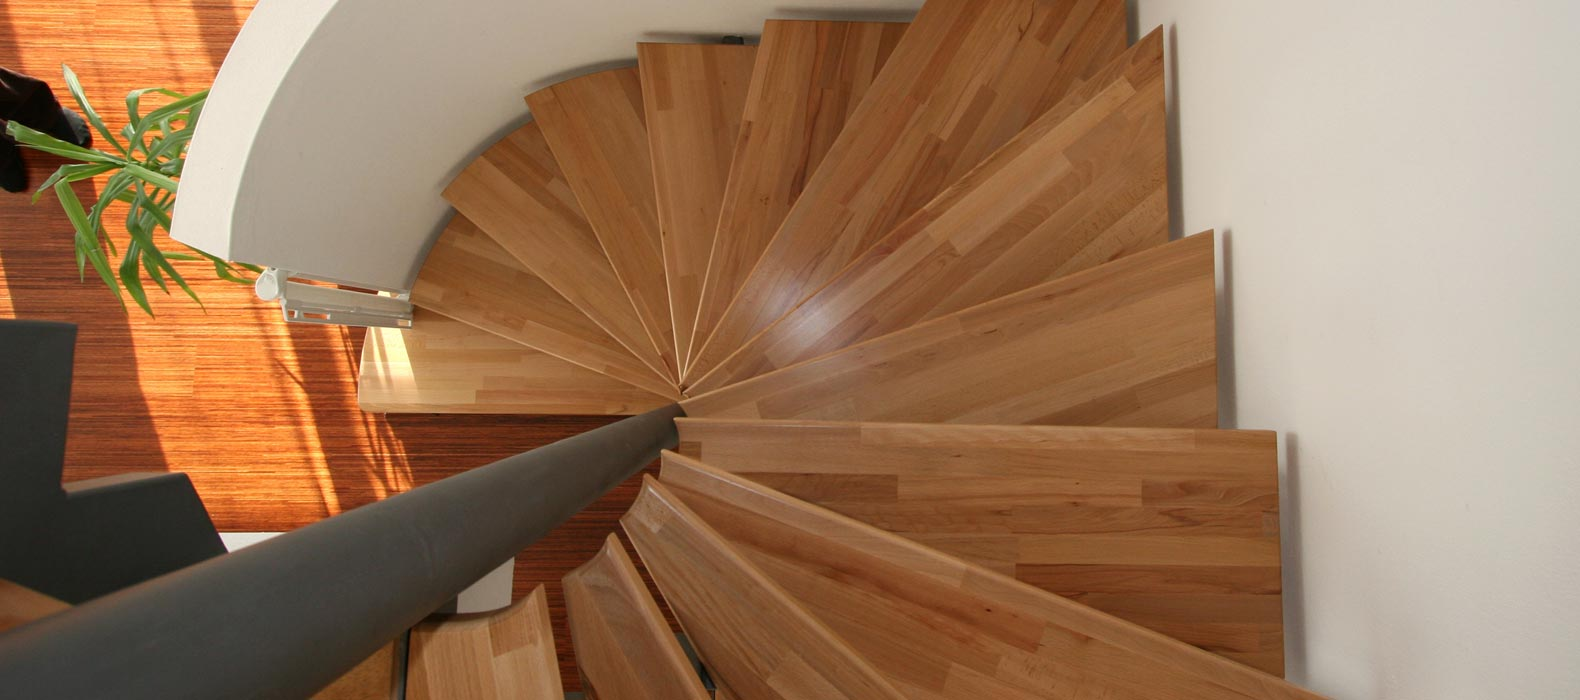 stahlholmtreppen von fhs treppen treppenhersteller f r fachkunden. Black Bedroom Furniture Sets. Home Design Ideas